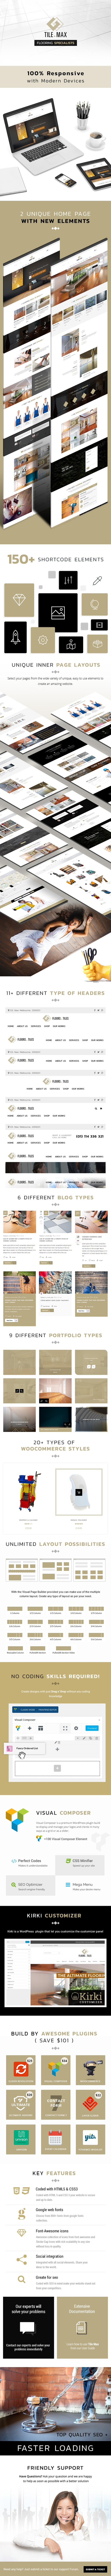 TileMax - Tiling, Flooring Company WordPress Theme - 1